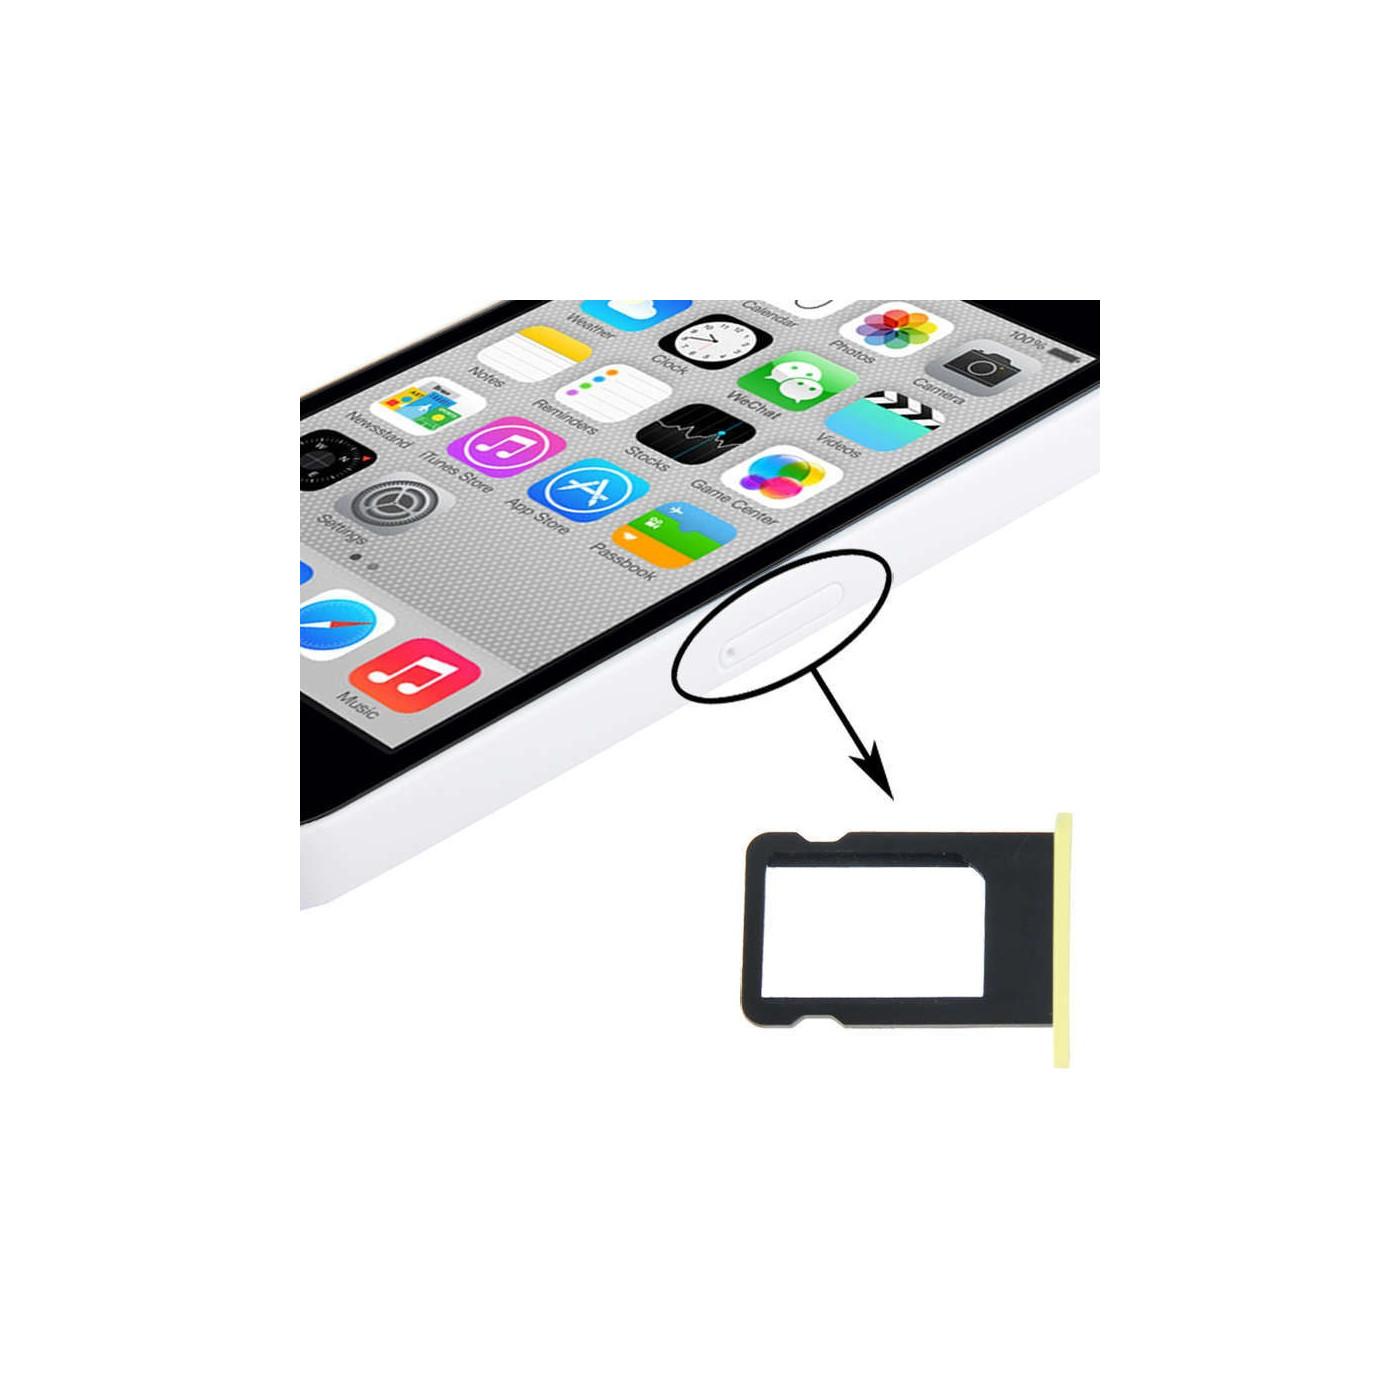 porta sim scheda apple iphone 5c giallo slot slitta carrello vassoio ricambio